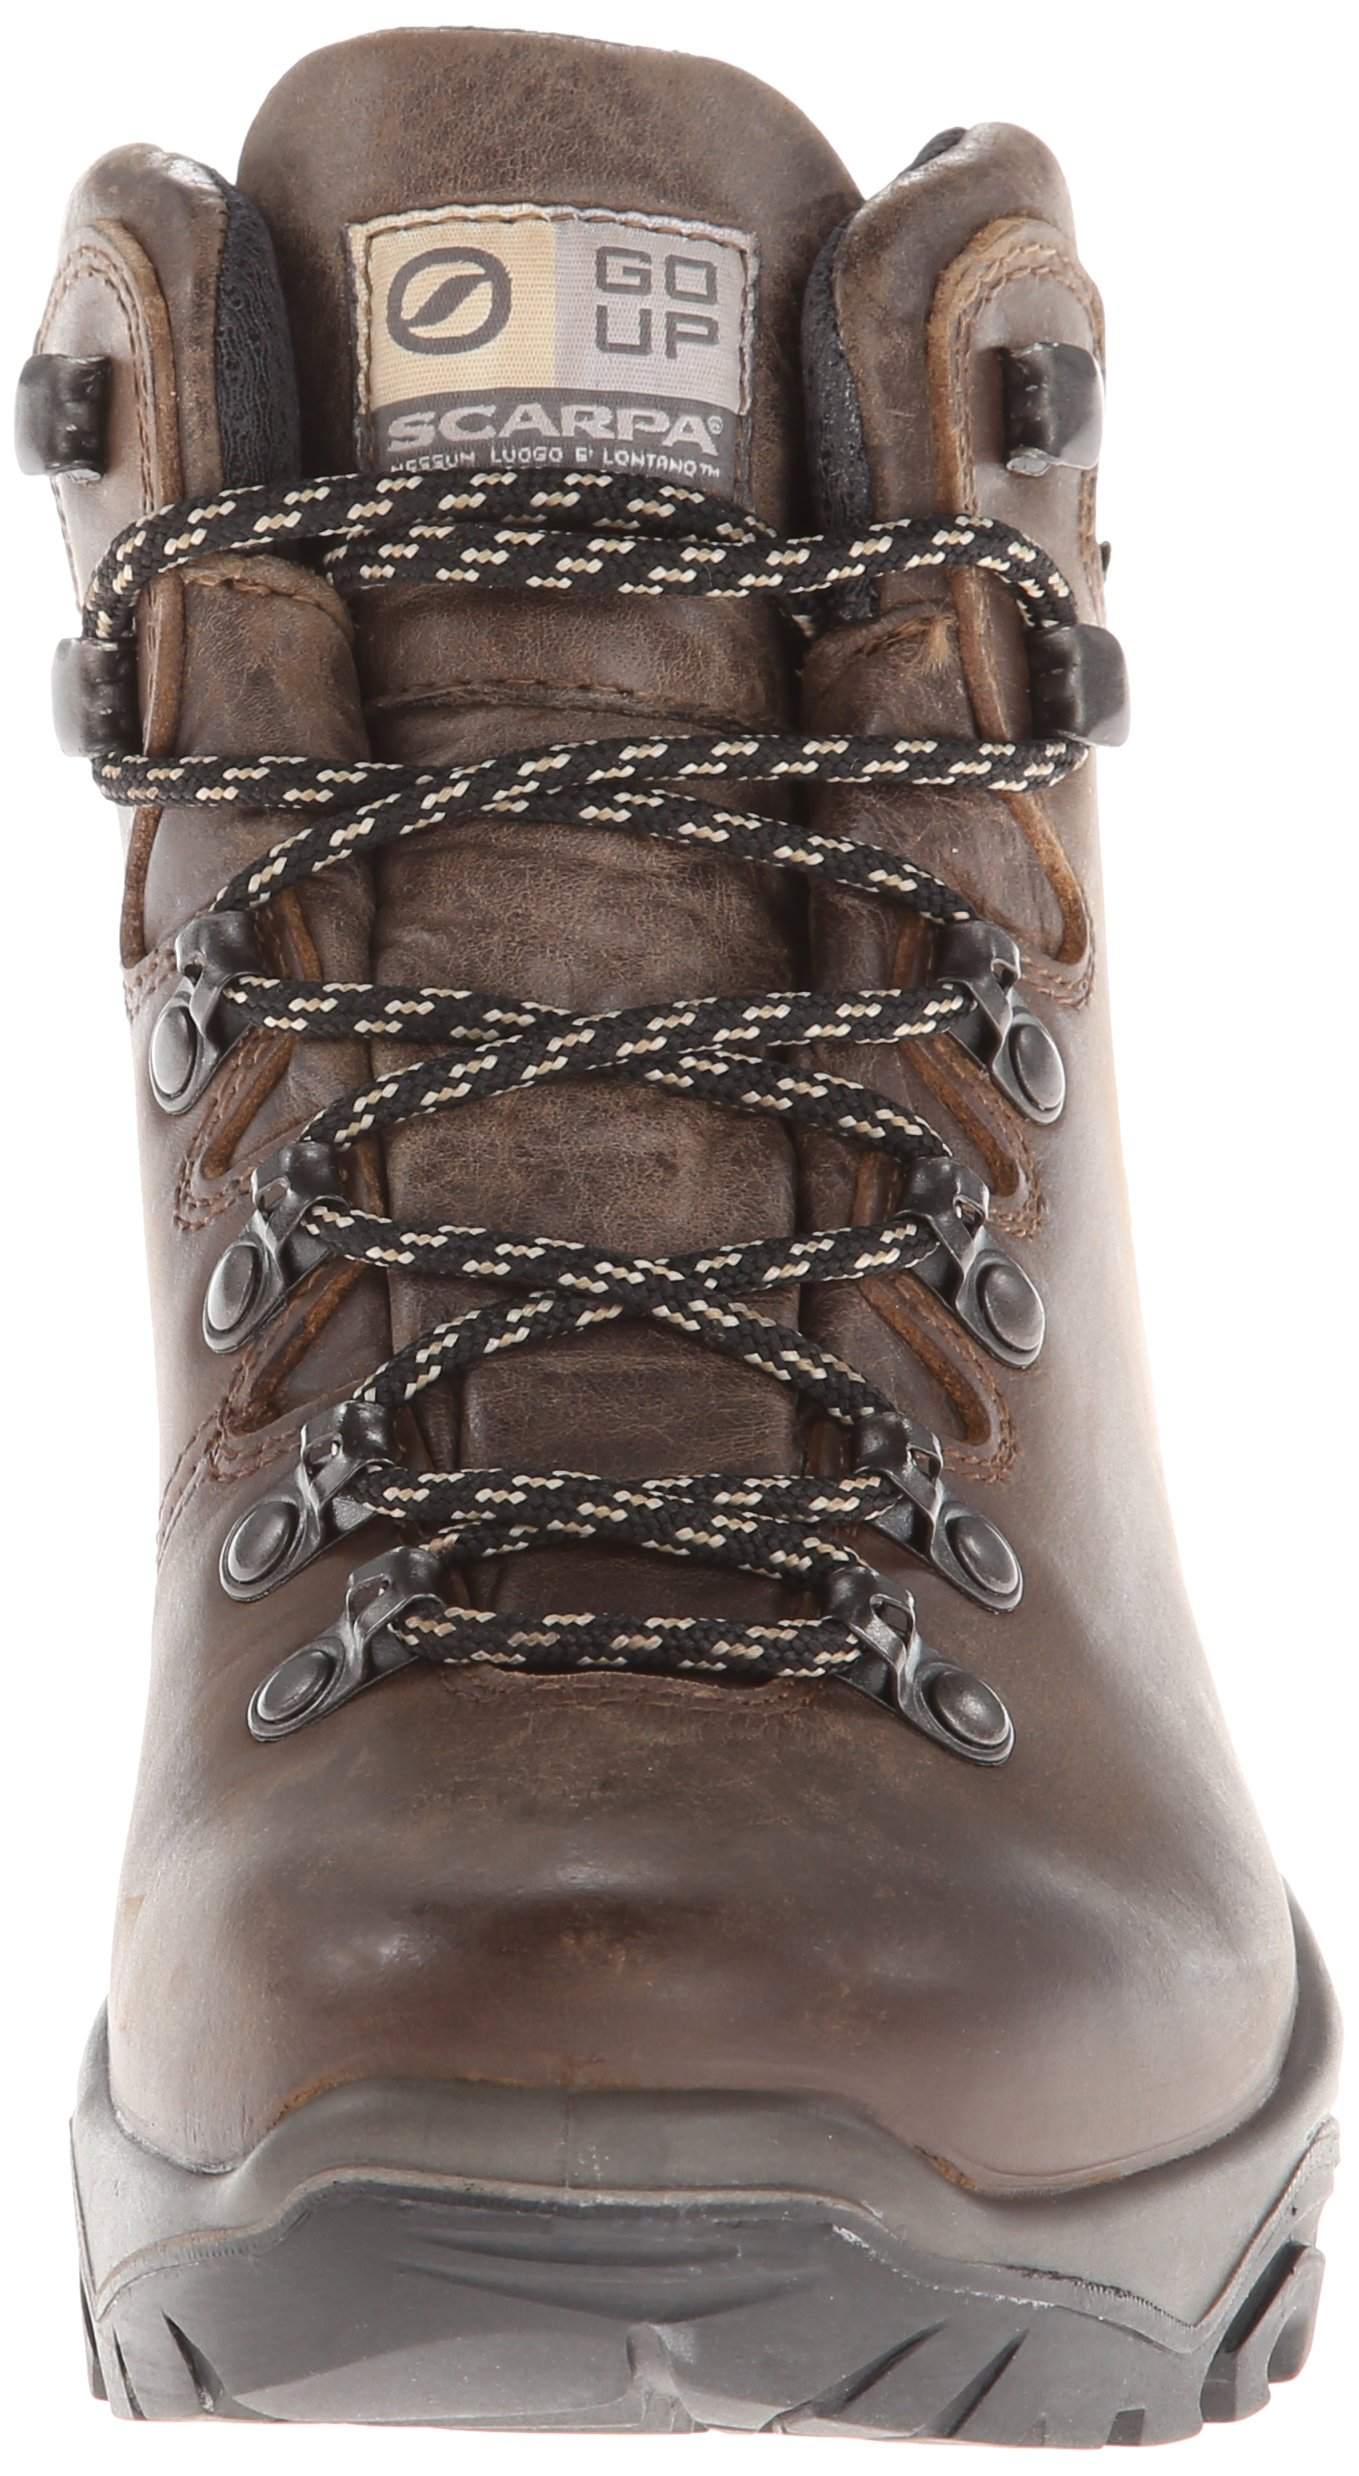 Scarpa Womens Women's Terra GTX Hiking Boot,Brown,42 EU/10 M US by SCARPA (Image #4)